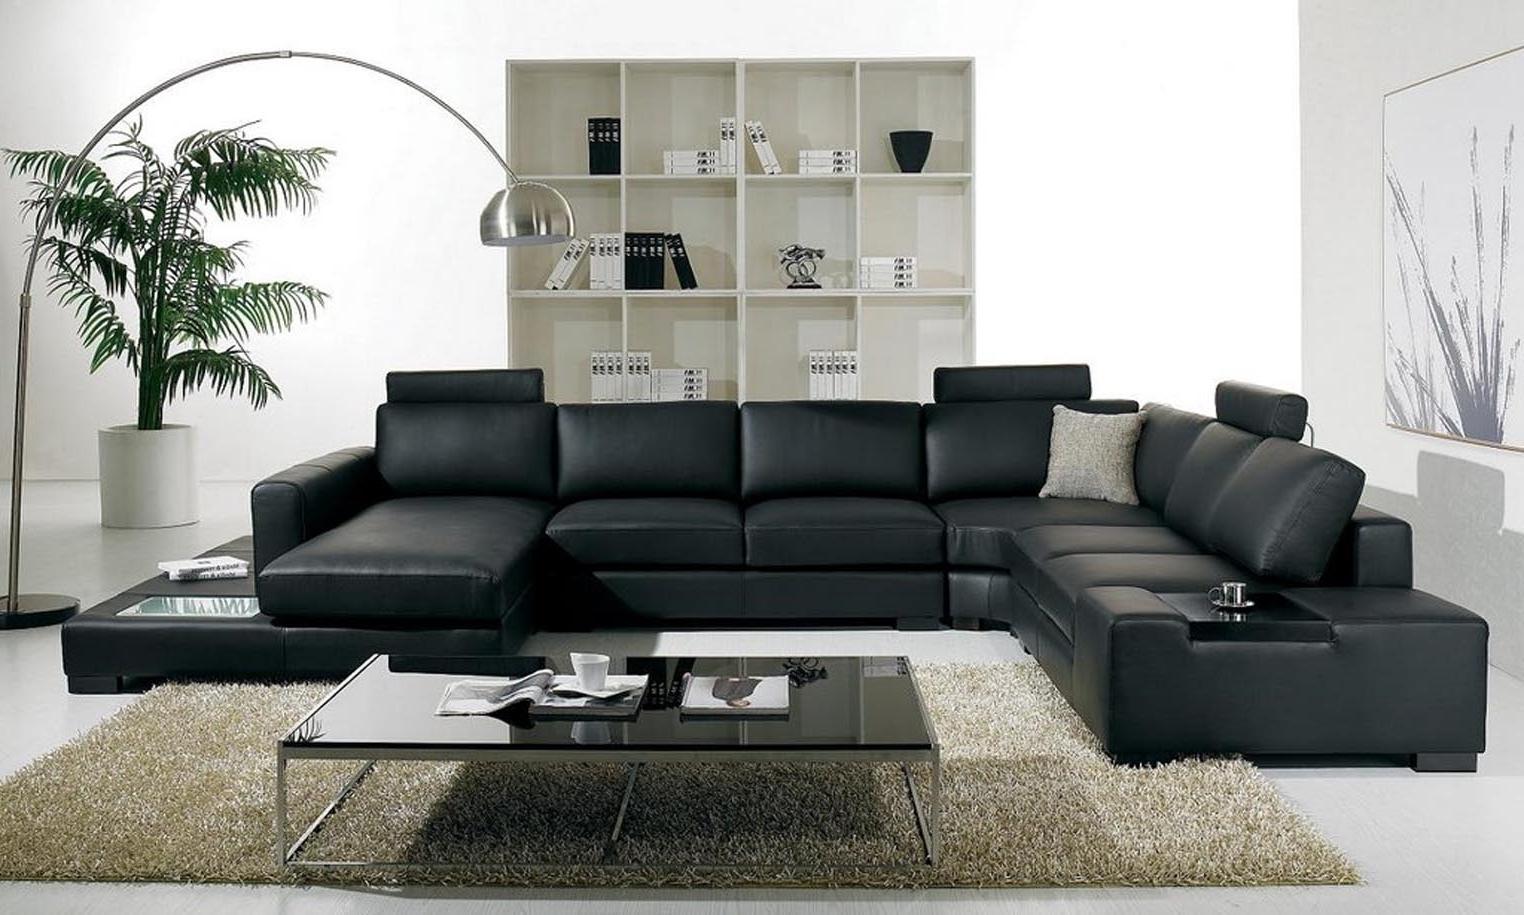 Fashionable Living Room Sofa Chairs Inside Living Room (View 3 of 20)